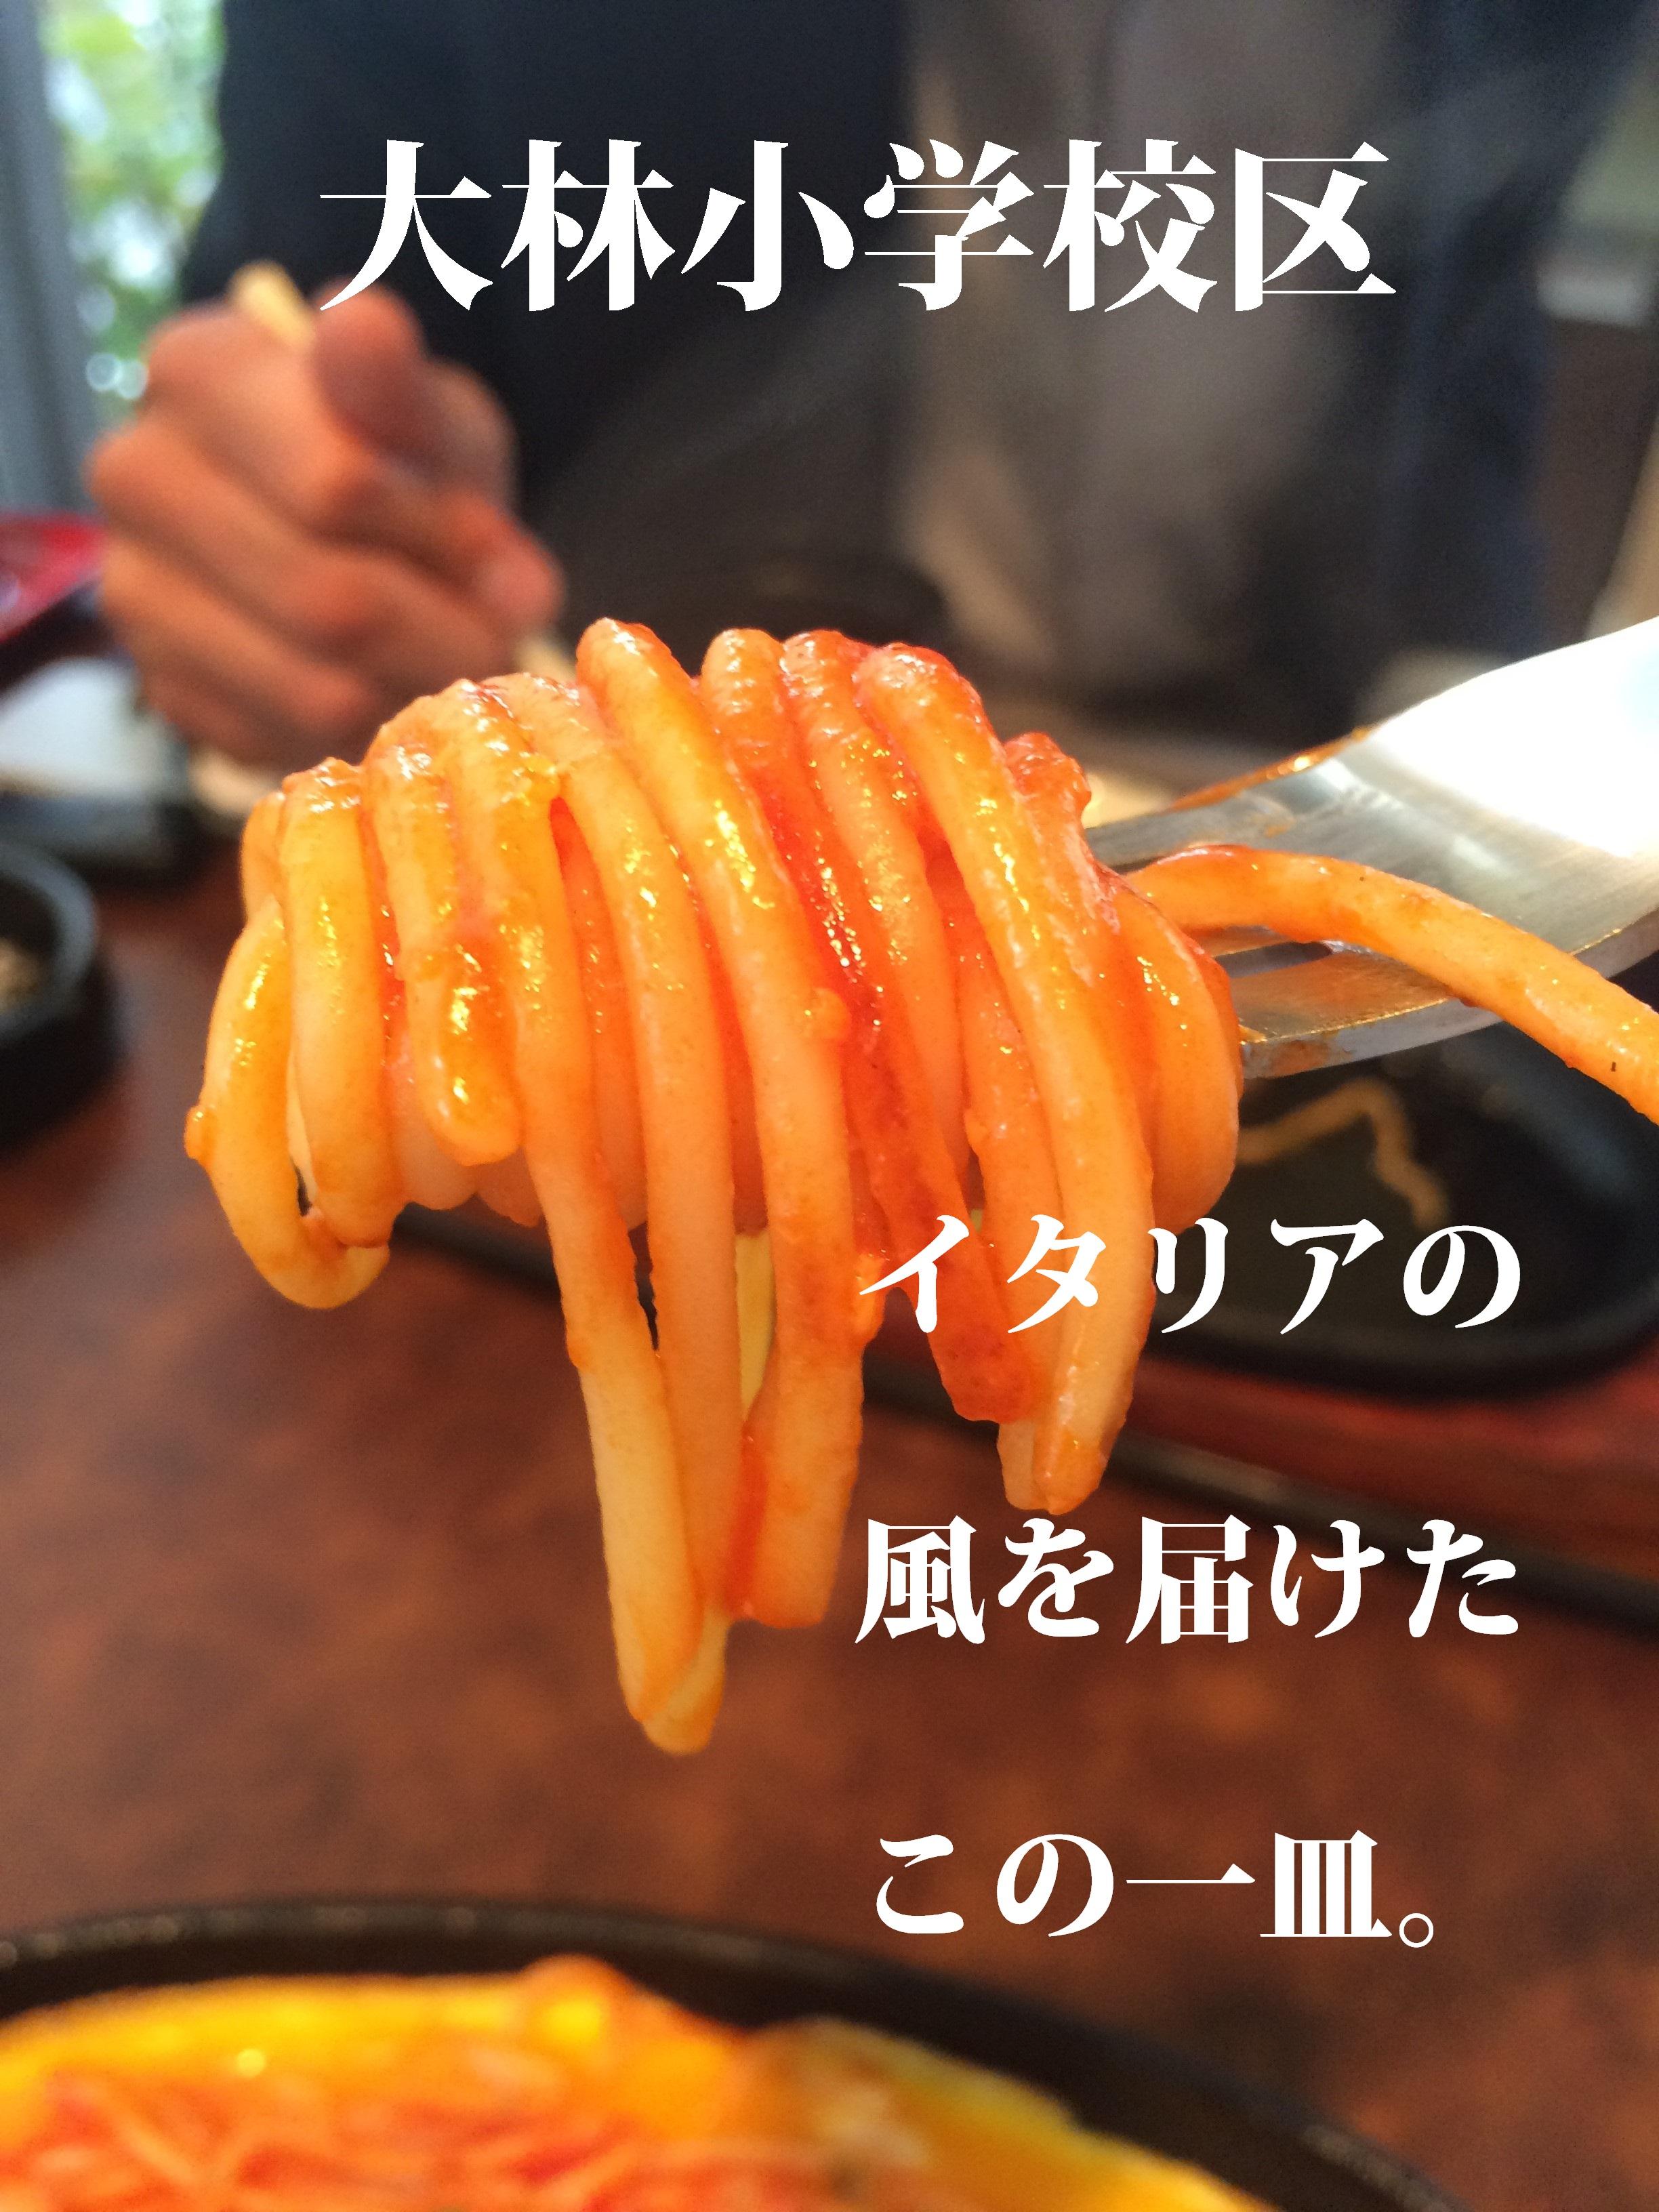 S__16891906.jpg